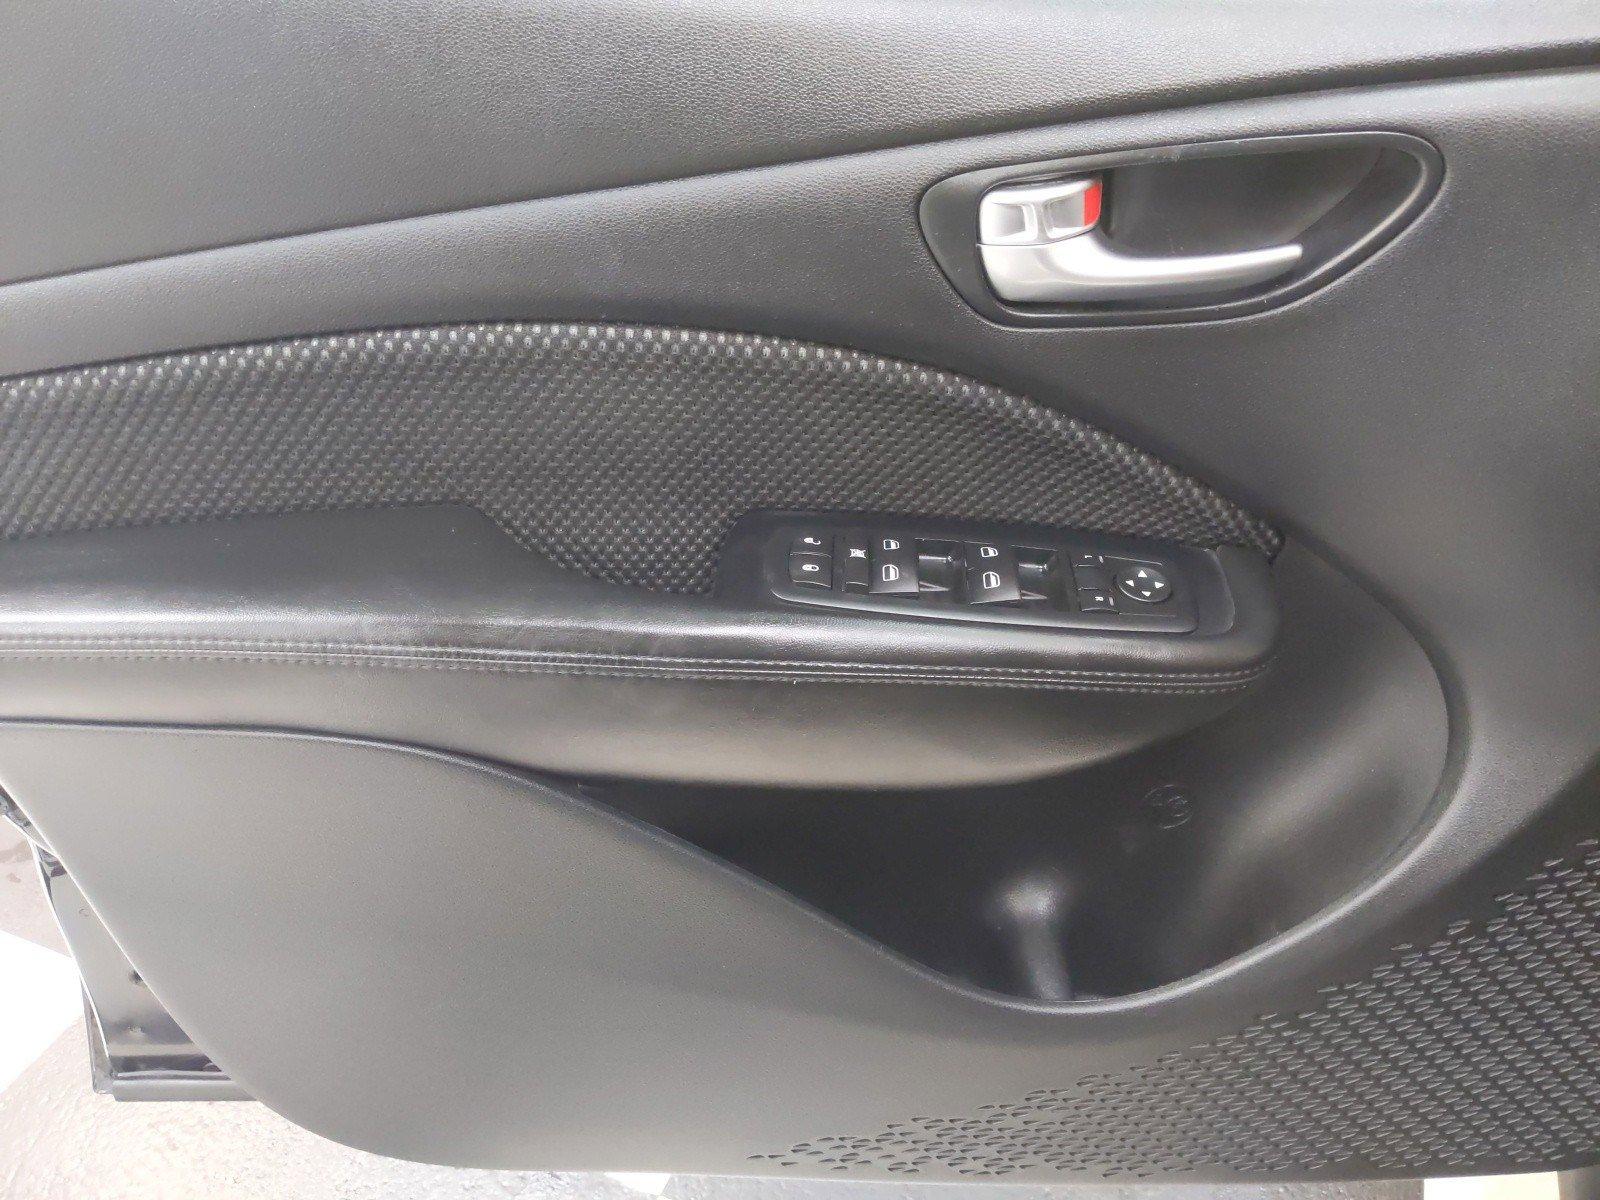 Used 2016 Dodge Dart SE 4dr Car for sale in Grand Island NE